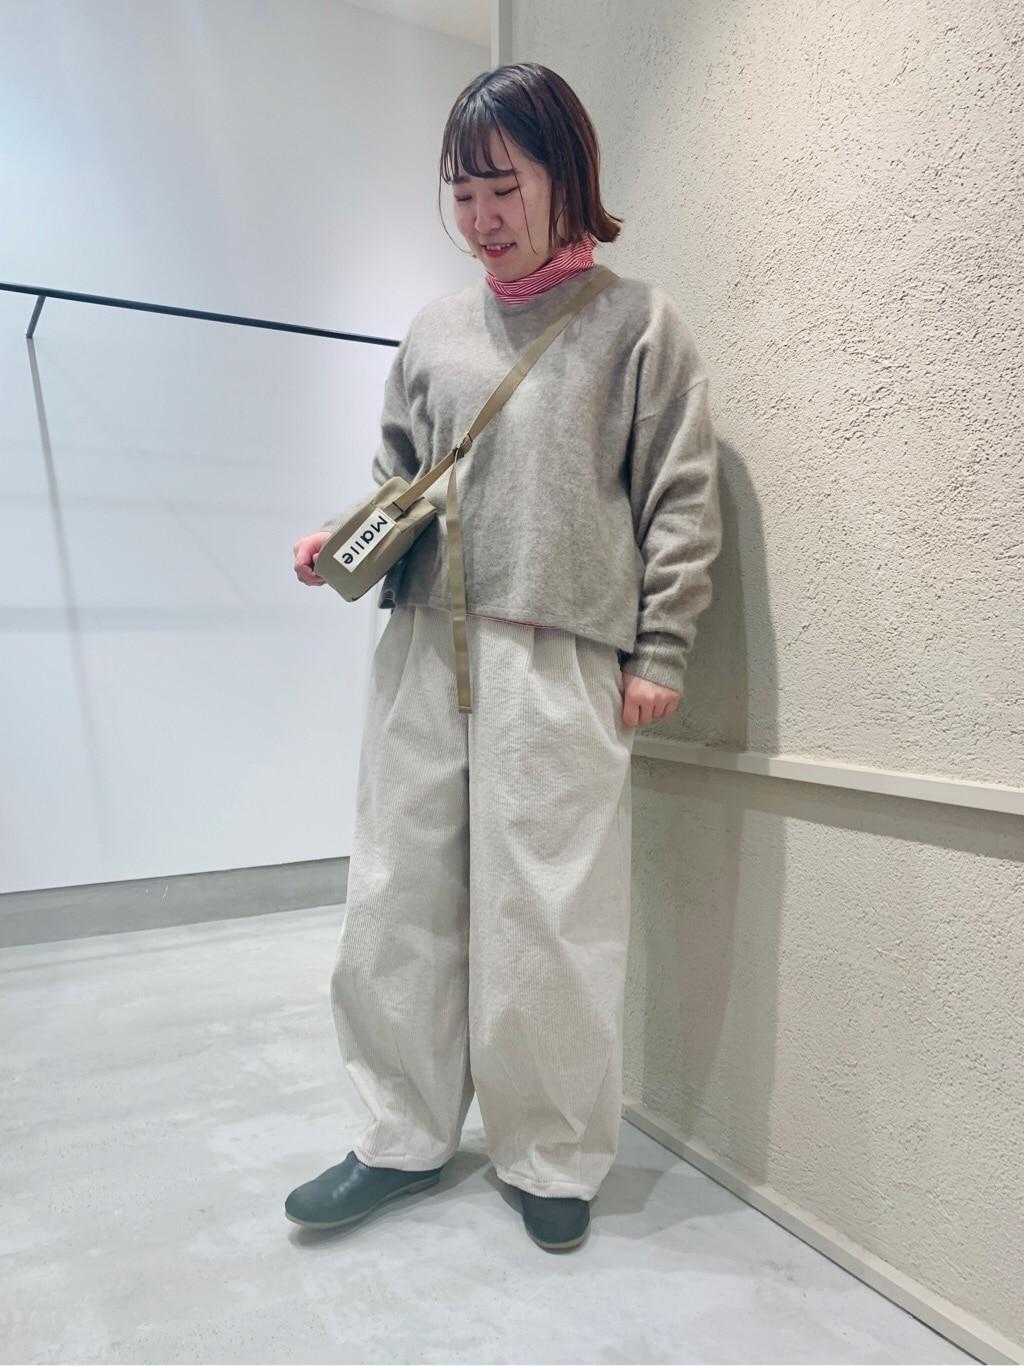 chambre de charme 横浜ジョイナス 身長:155cm 2020.11.02